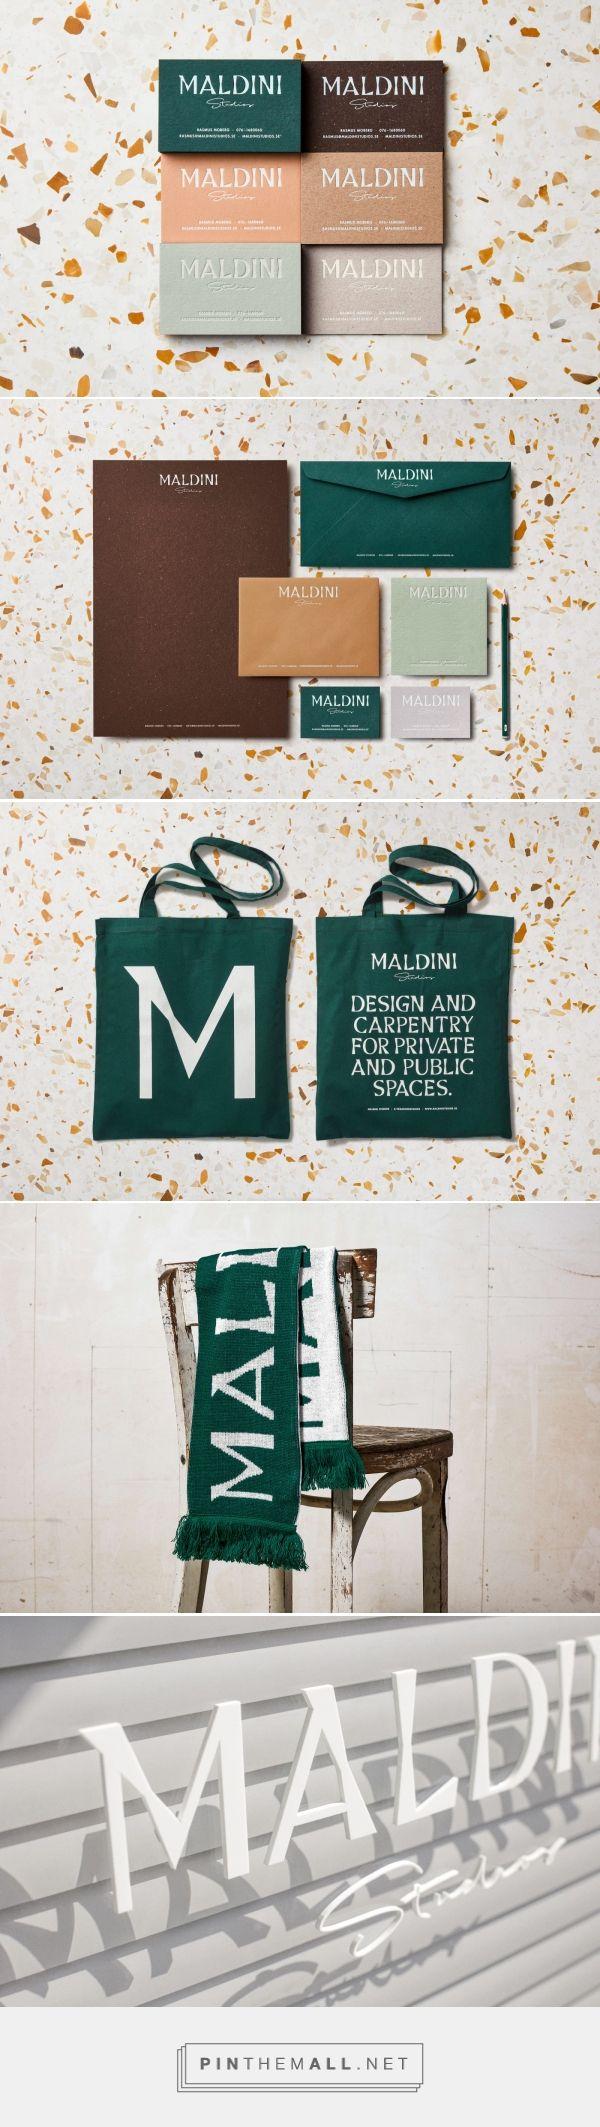 Maldini Studios Interior Design and Carpenter Firm Branding by Jens Nilsson | Fivestar Branding Agency – Design and Branding Agency & Curated Inspiration Gallery #design #designinspiration #branding #brandidentity #stationery